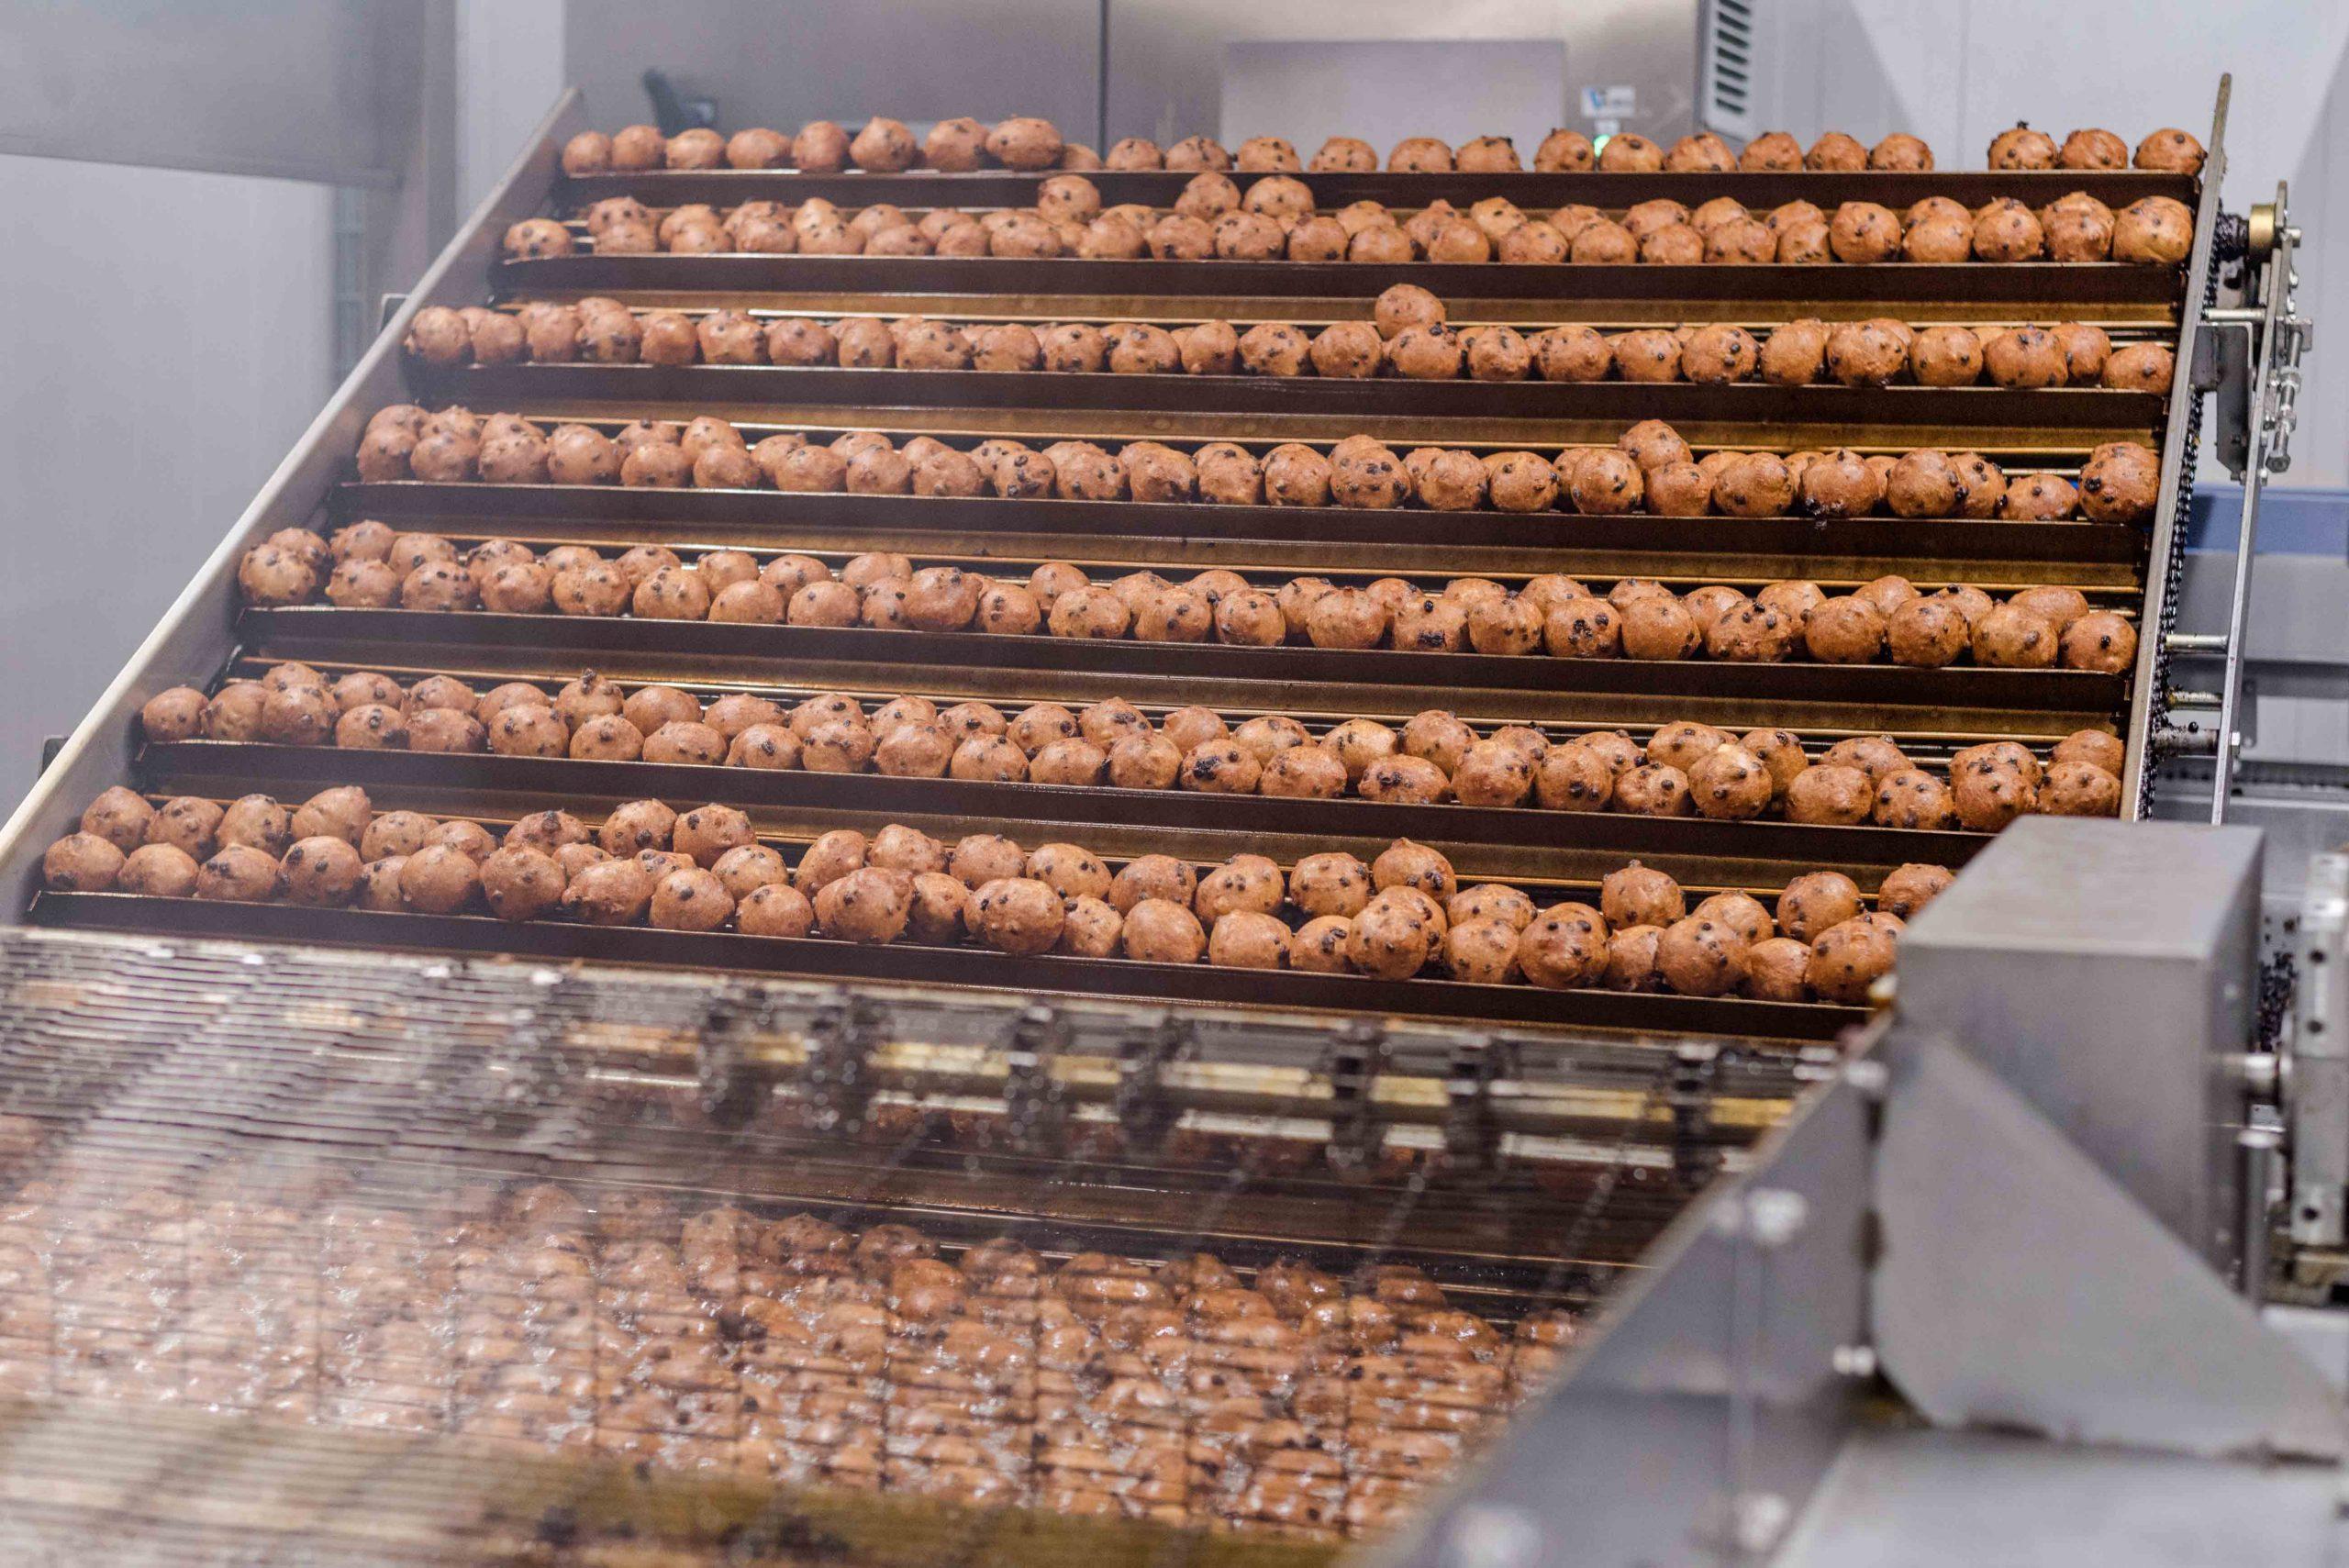 Bolas de rosquilla fritas-De Graaf Bakeries